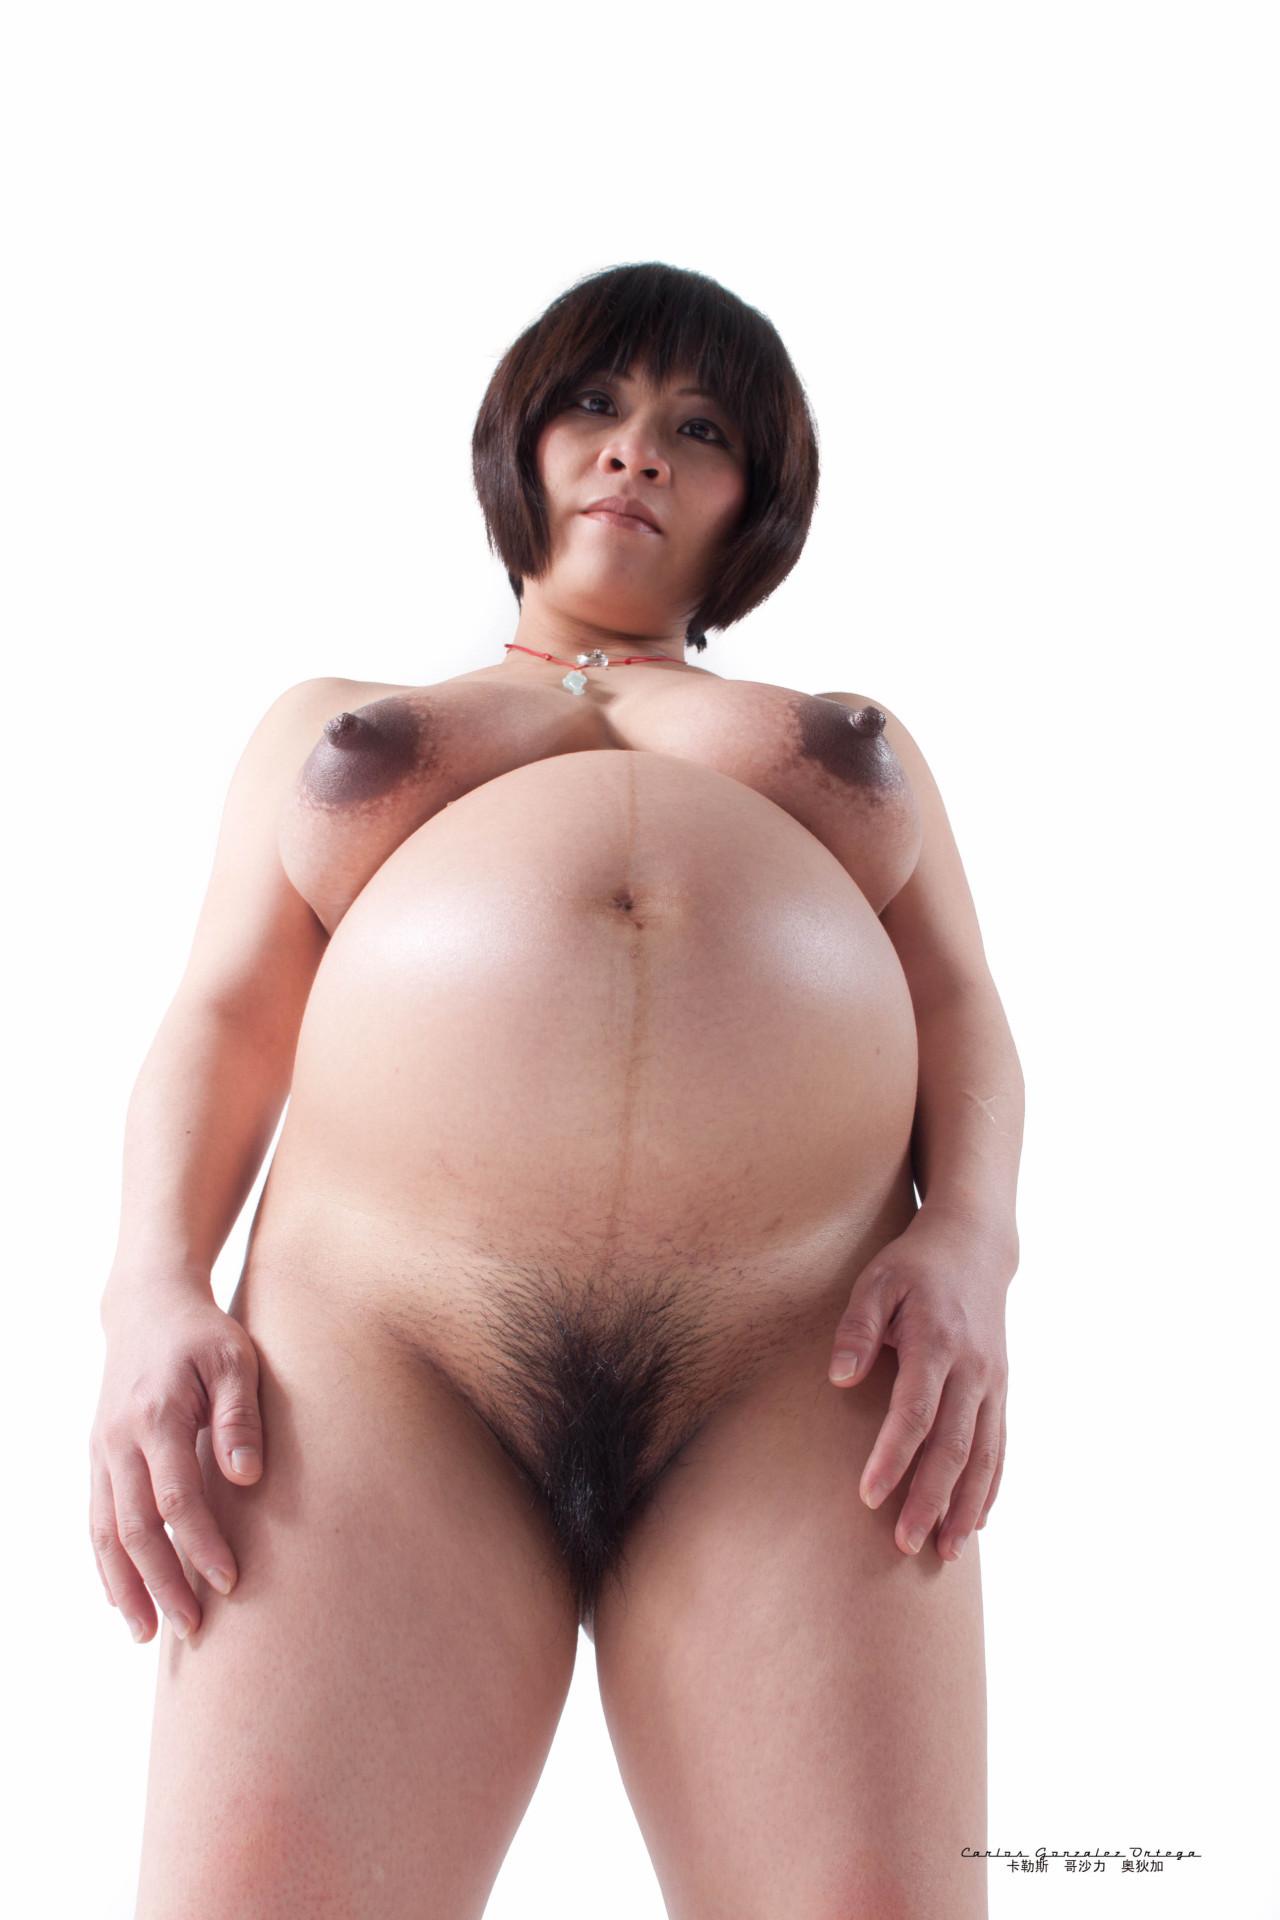 sexual intercourse nude motion